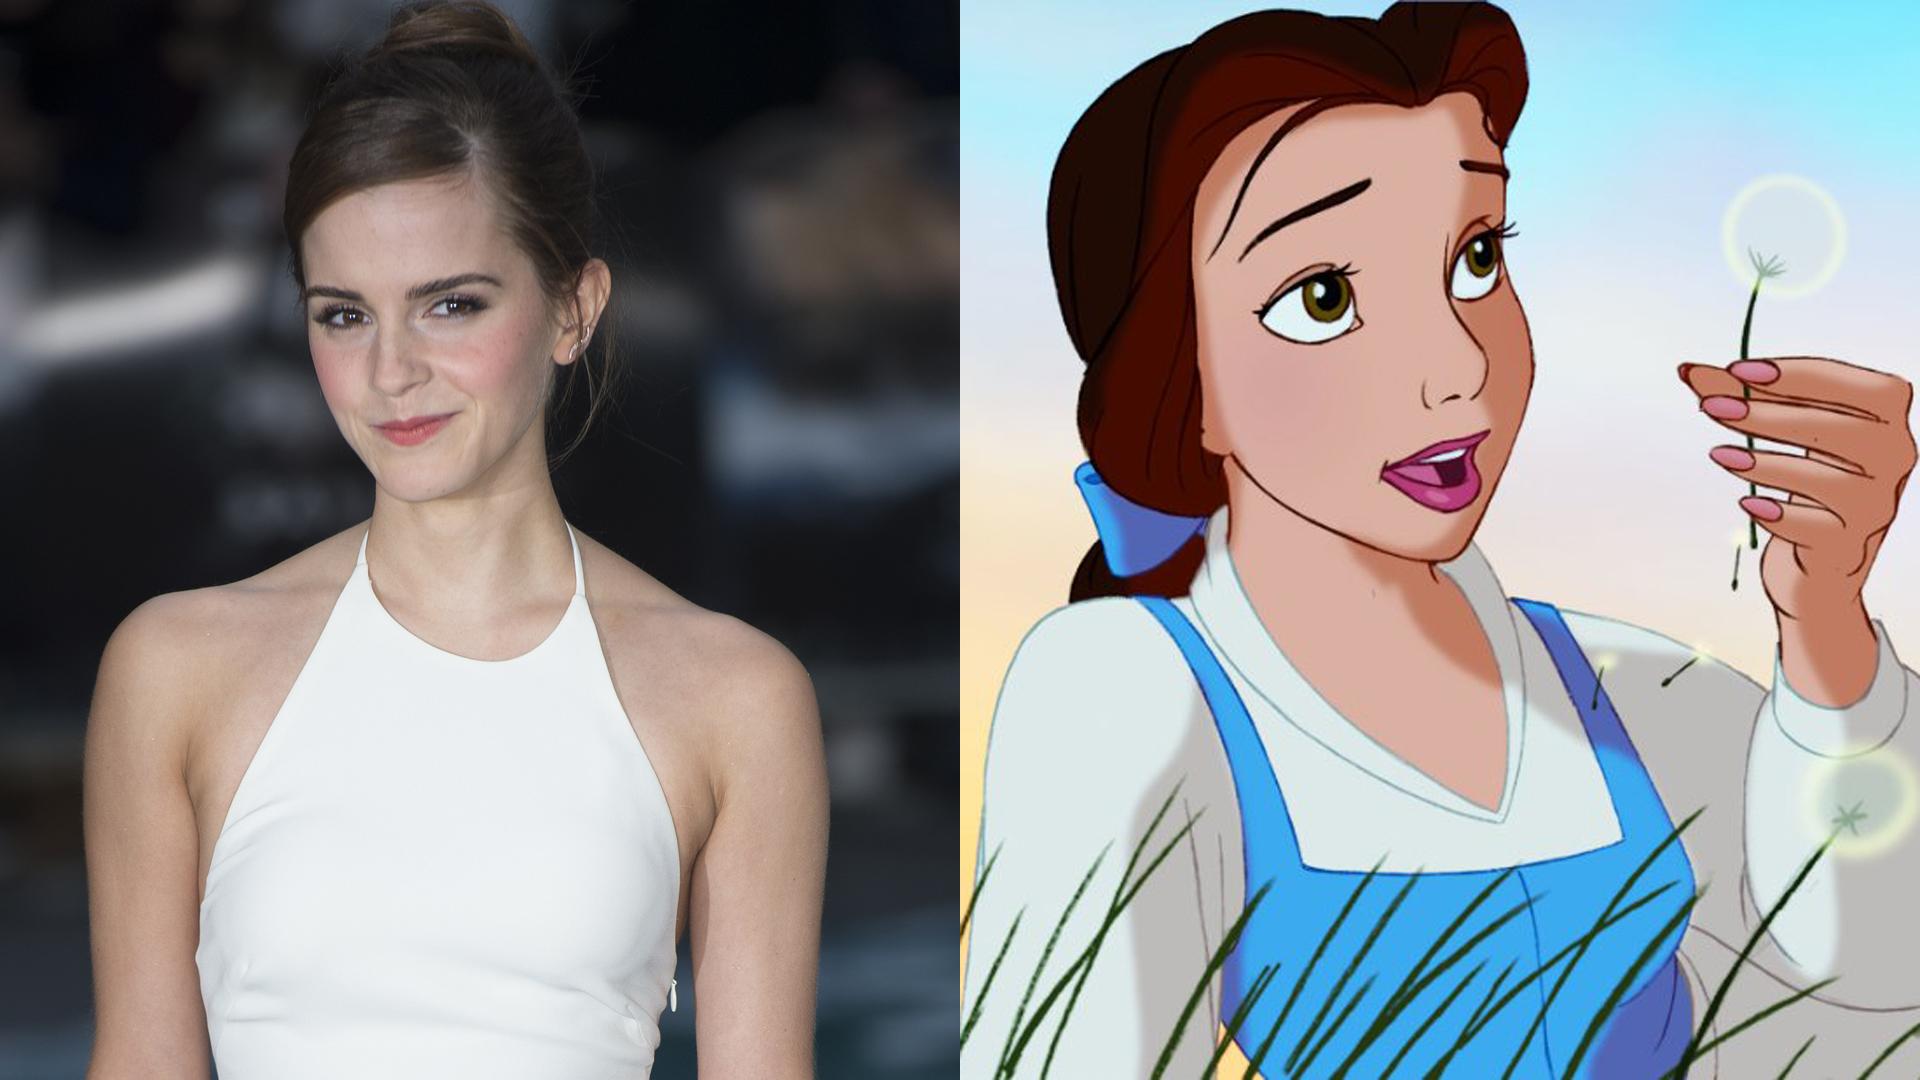 Emma Watson and Belle